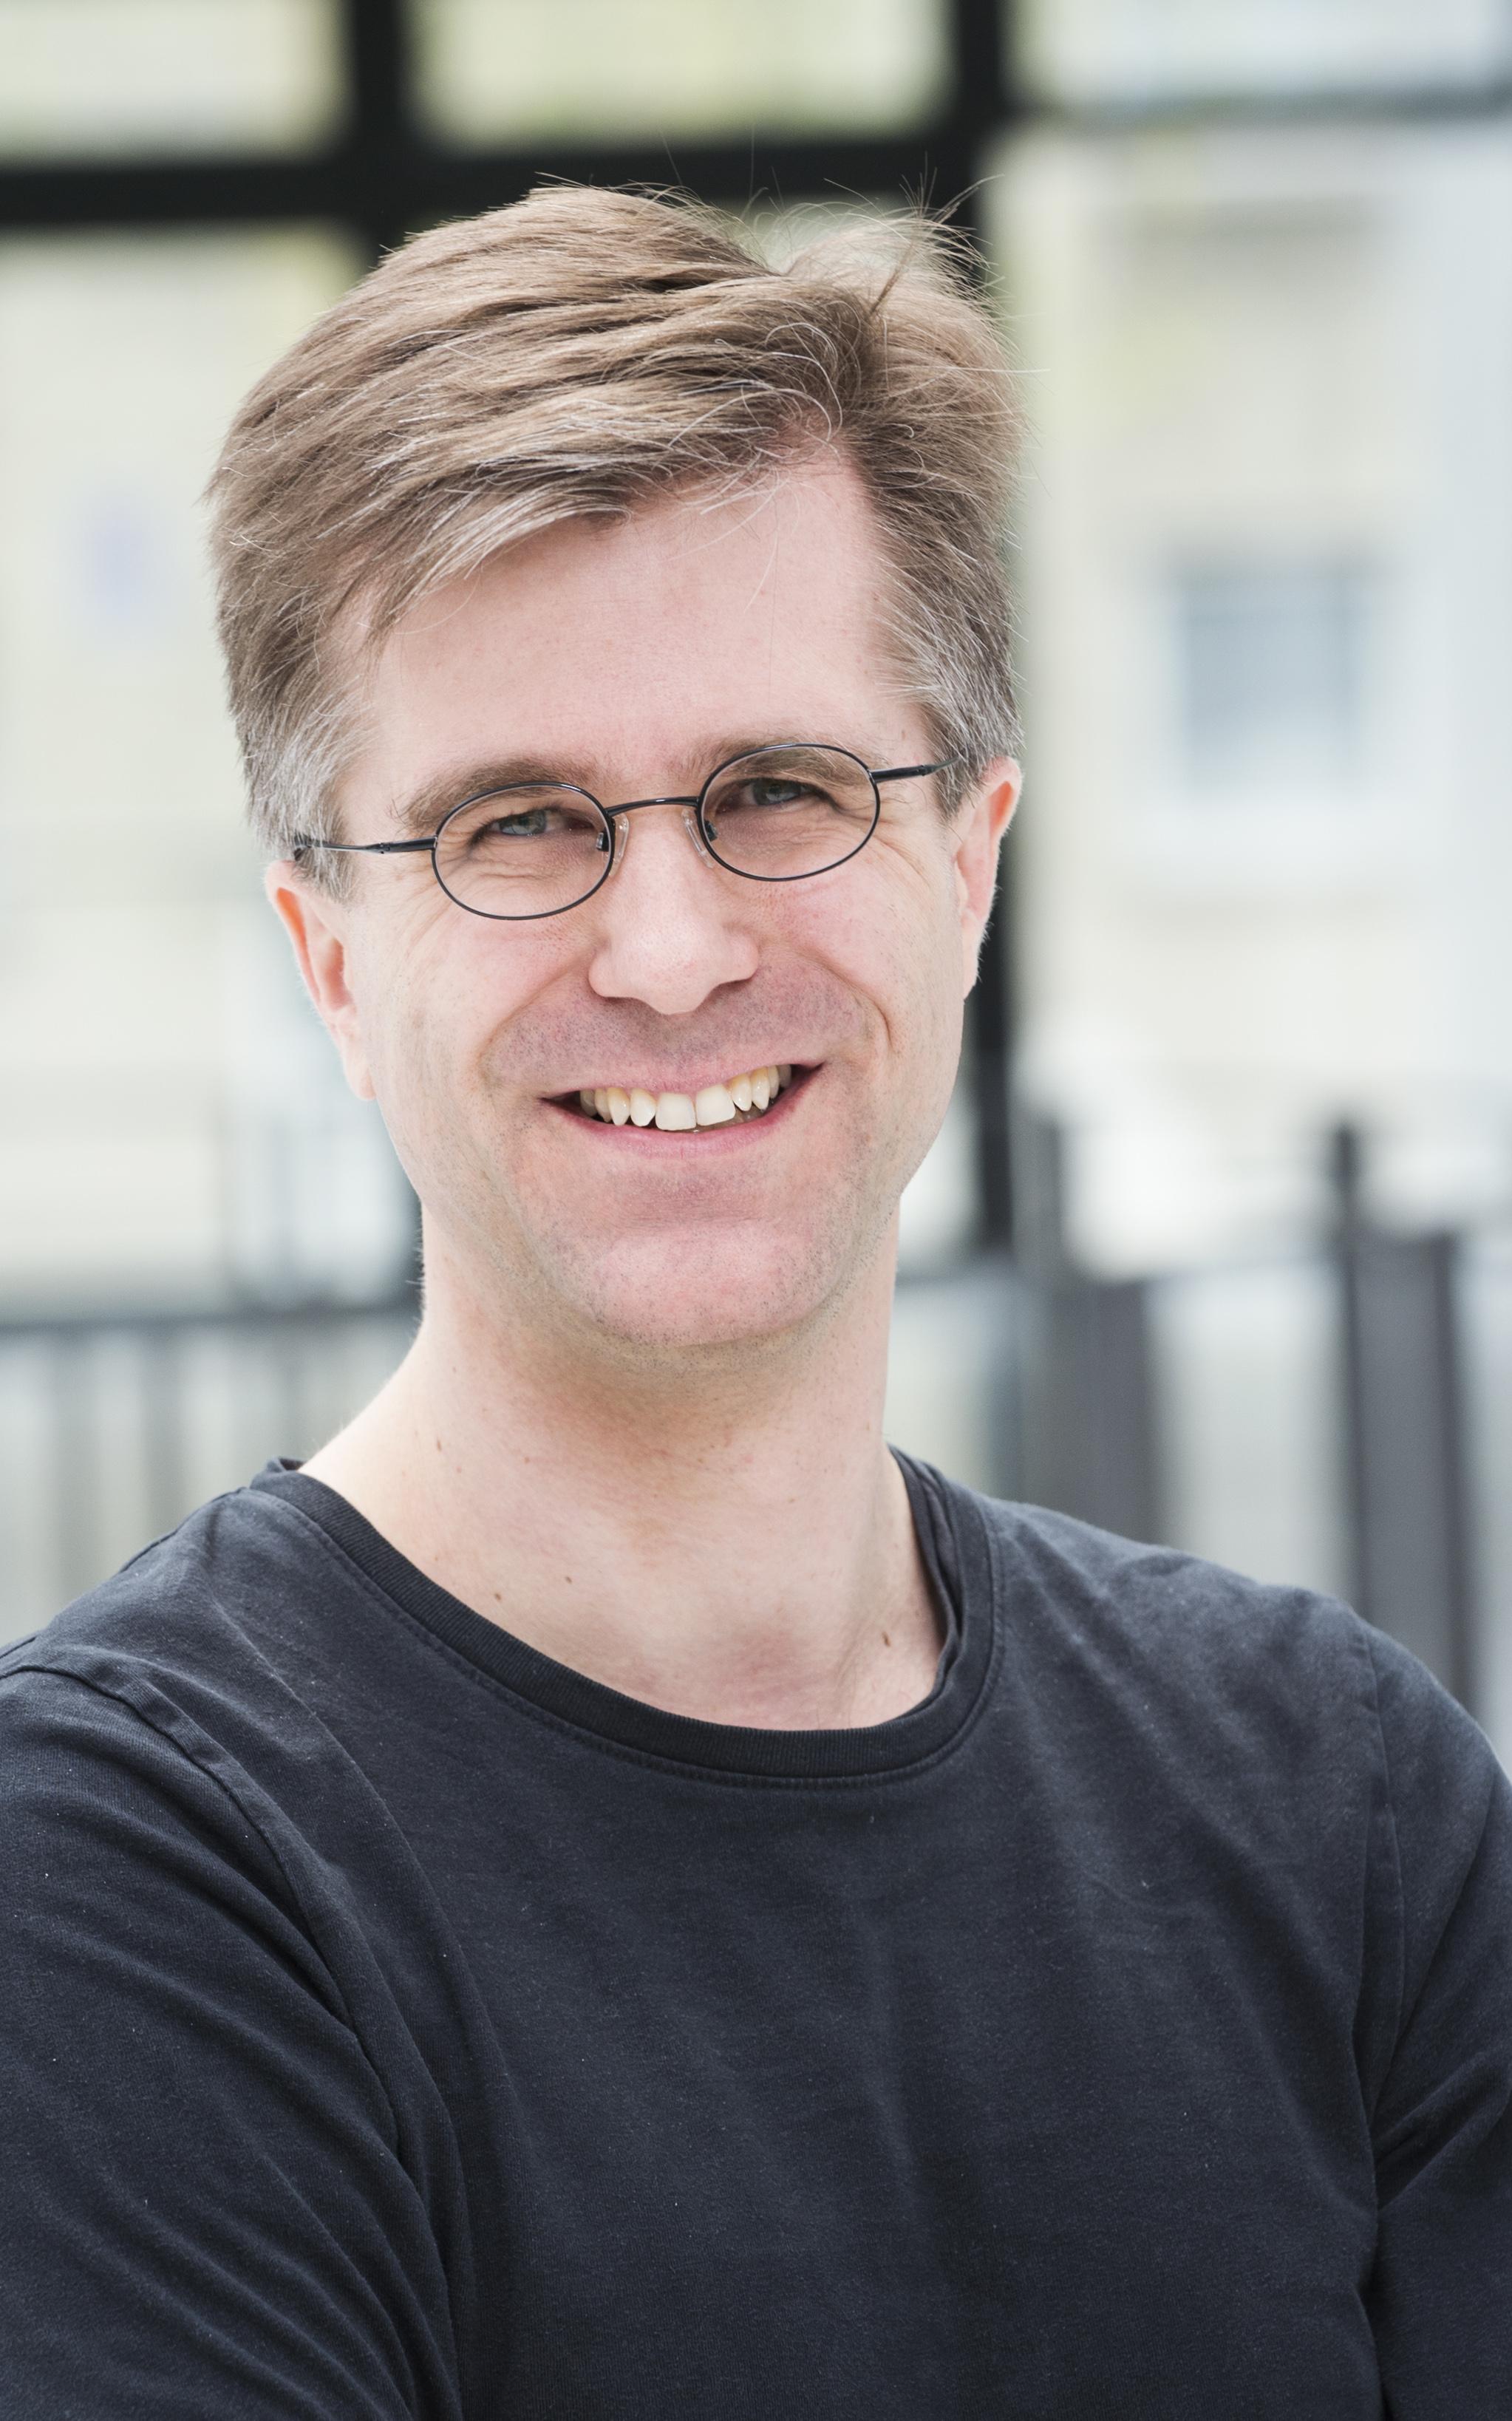 Professor Christopher Barner-Kowollik